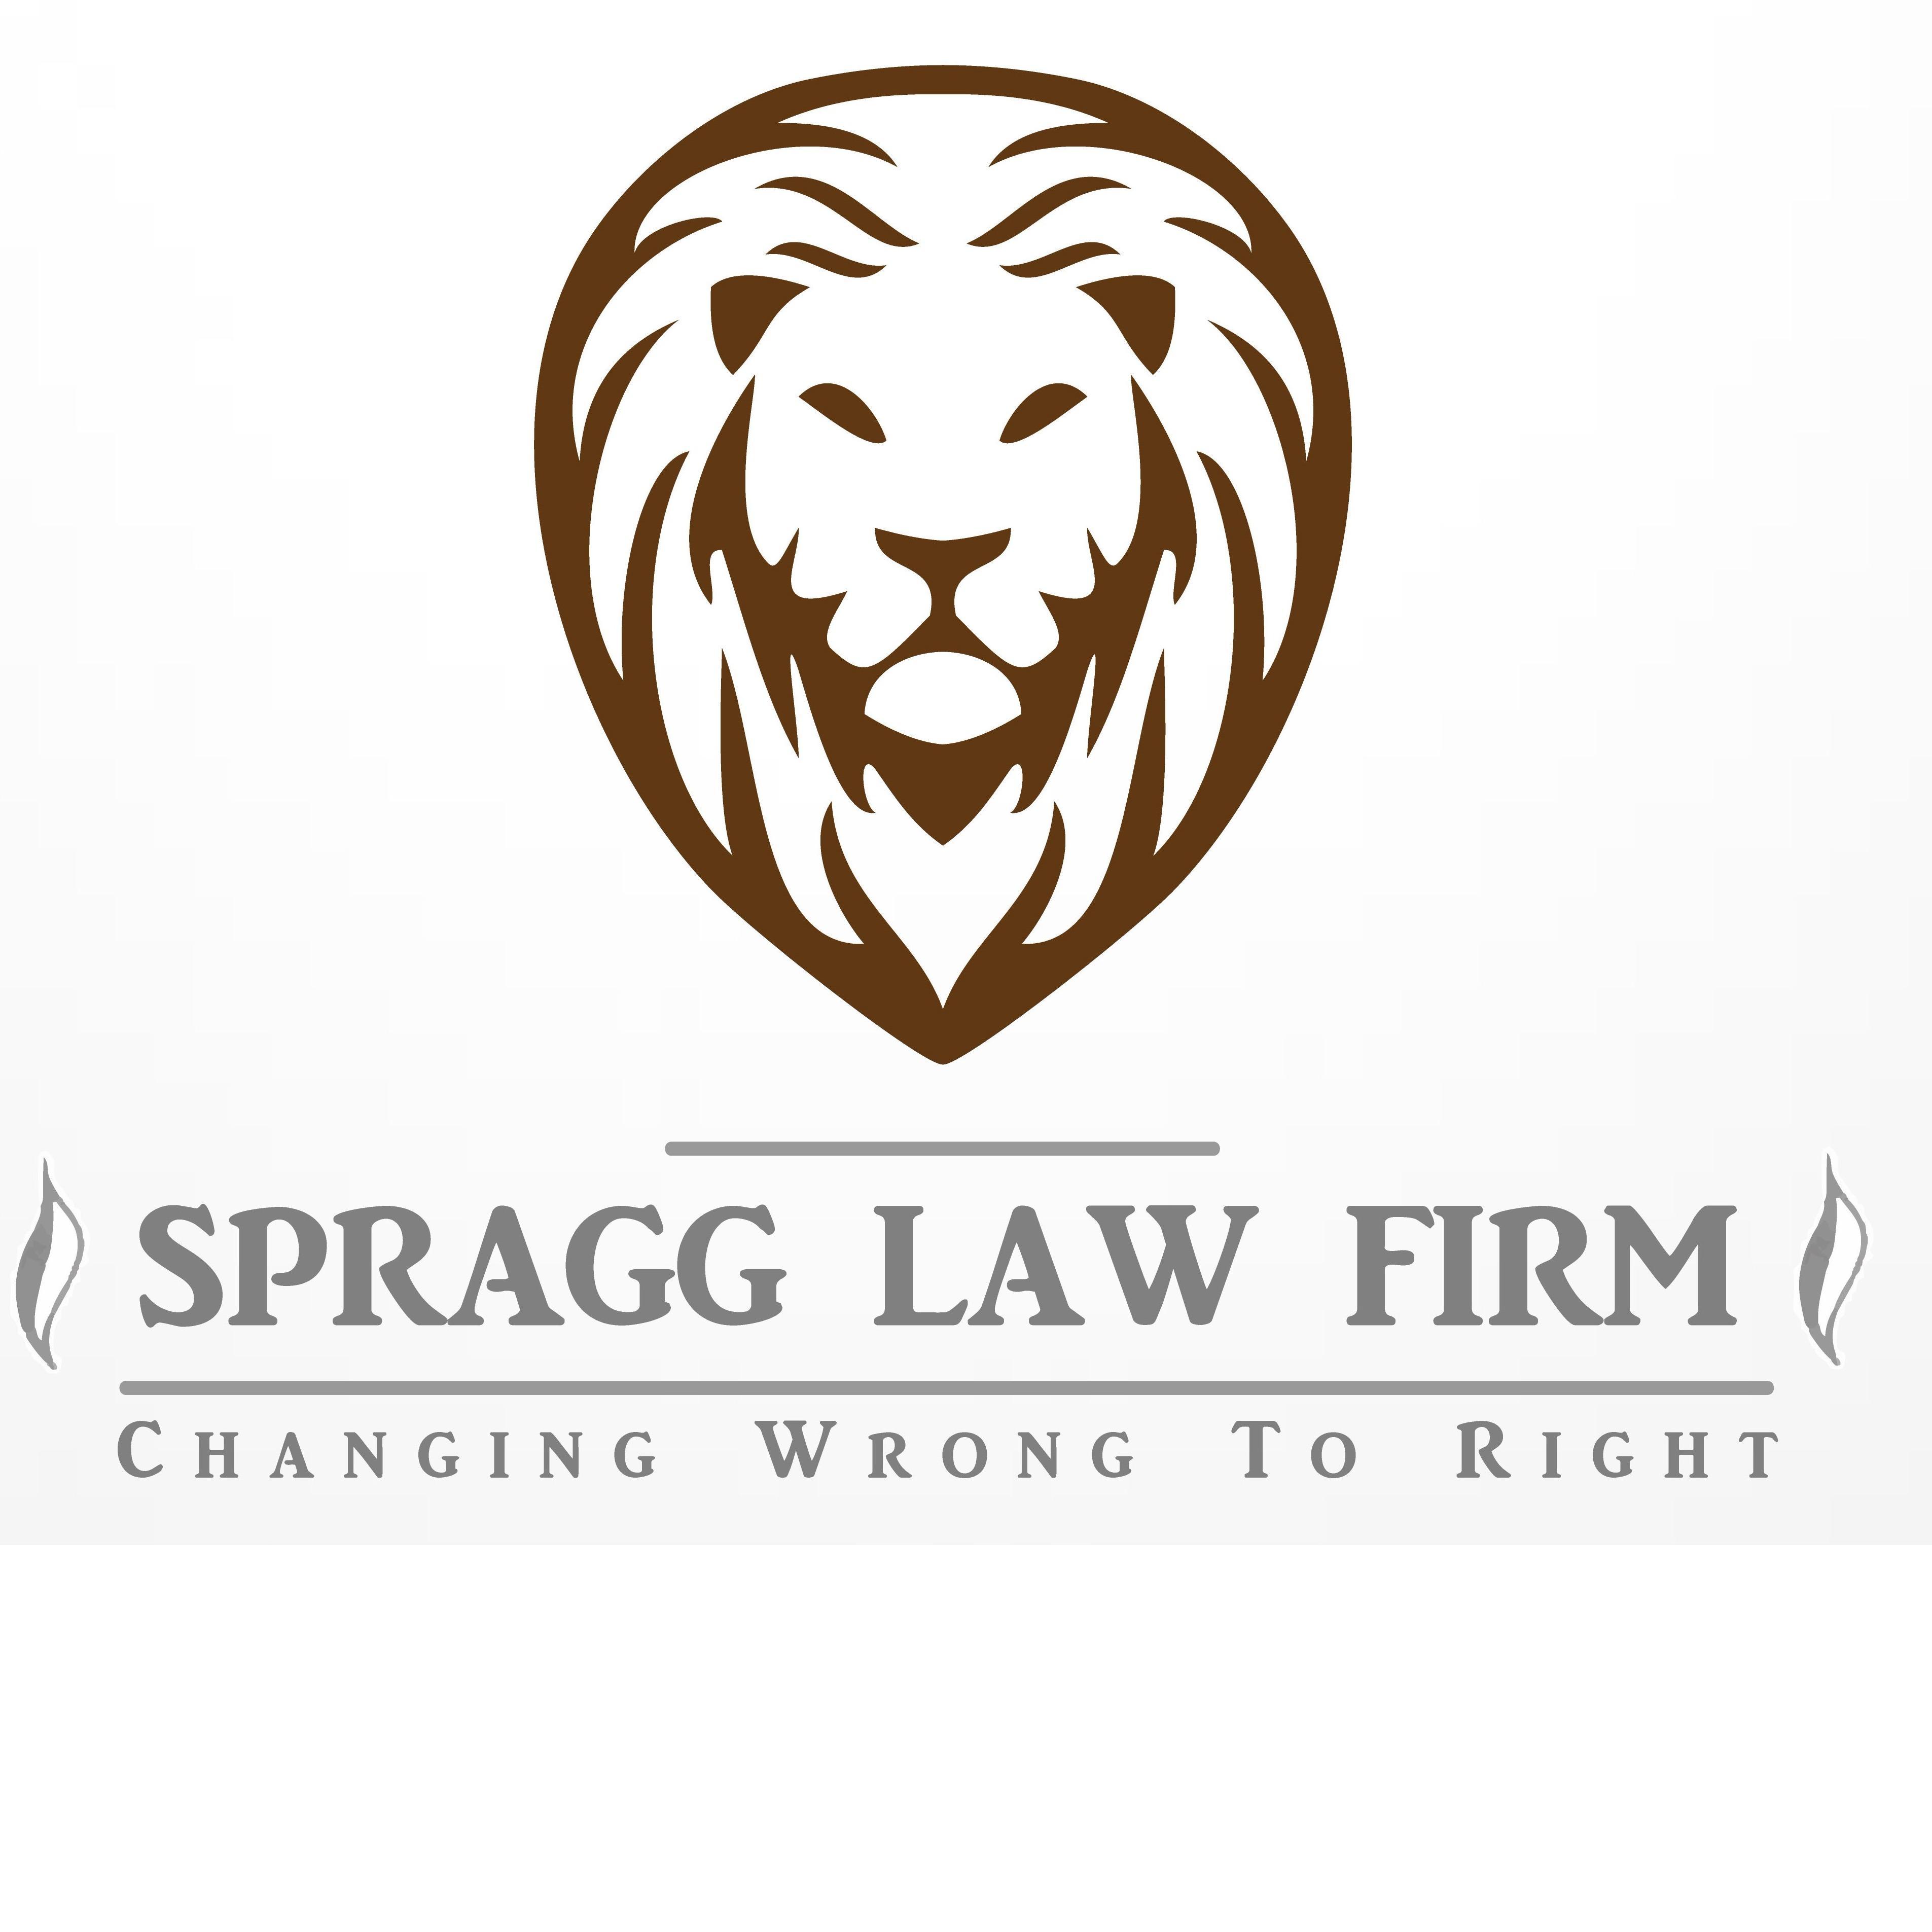 Spragg Law Firm